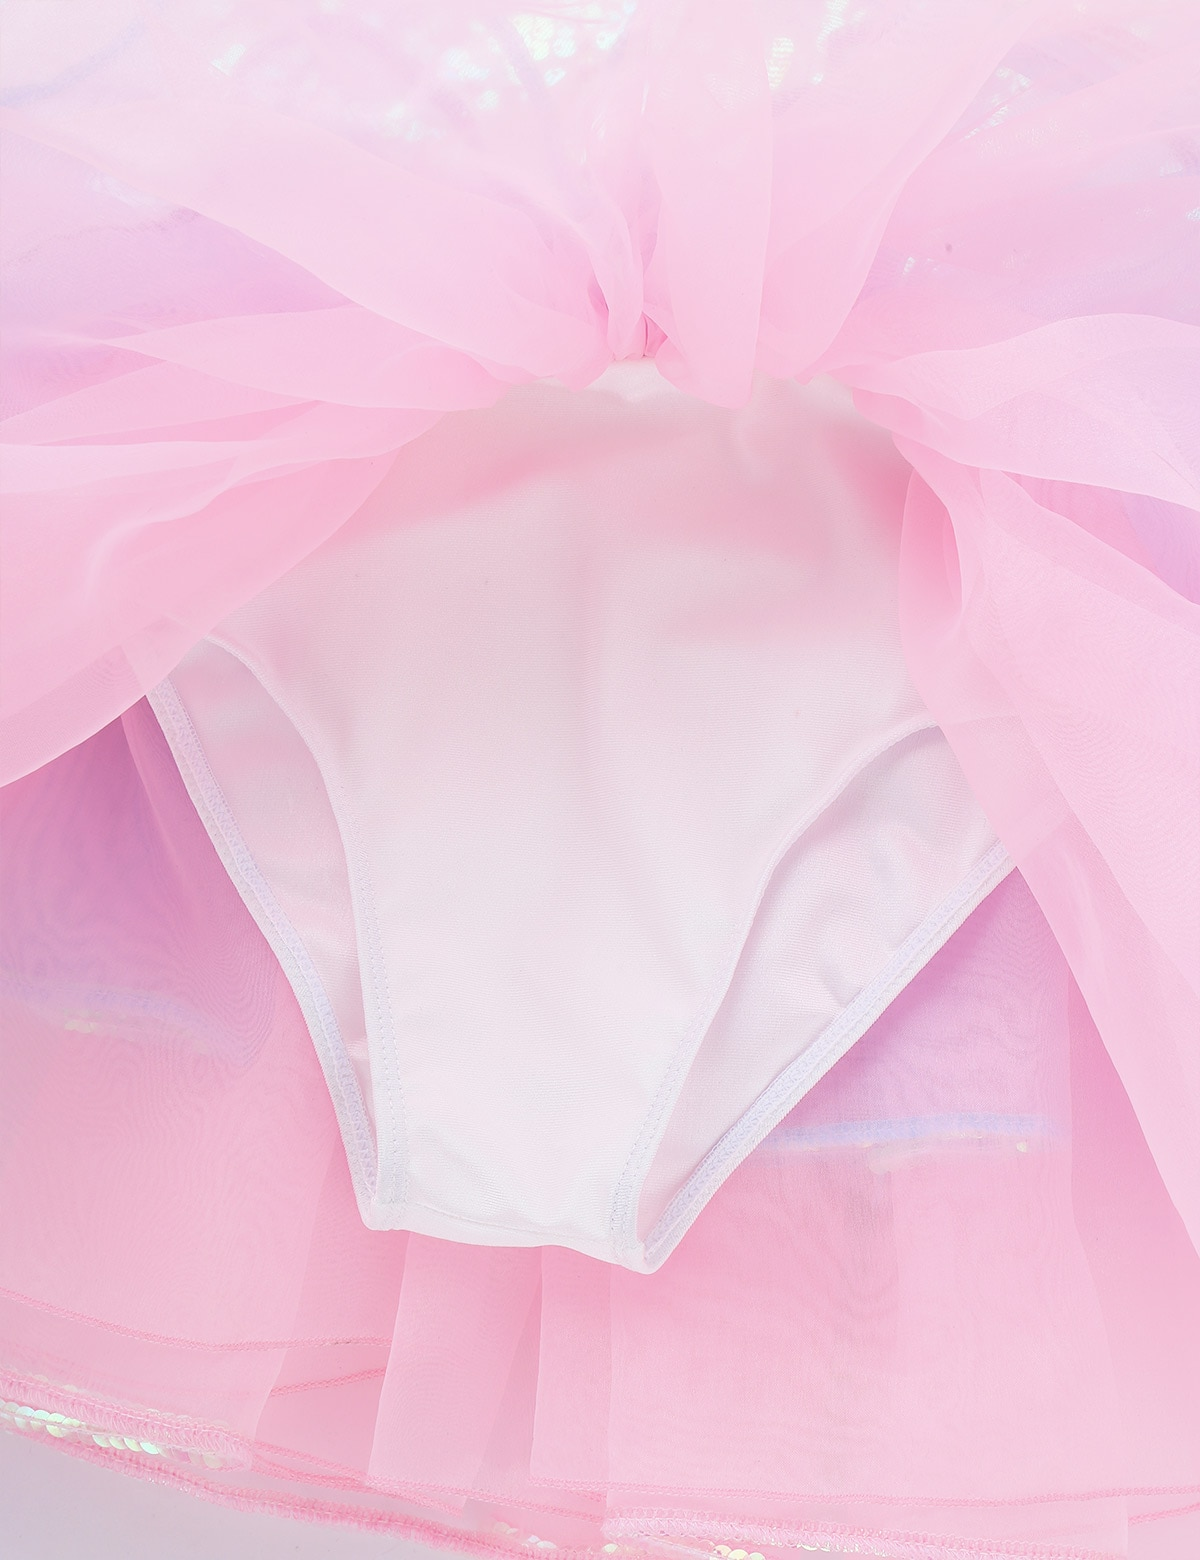 Kids Girls Shiny Sequins Bowknot Mesh Splice Dancewear Ballet Gymnastics Leotard Tutu Ballet Dress Performance Competition Dress